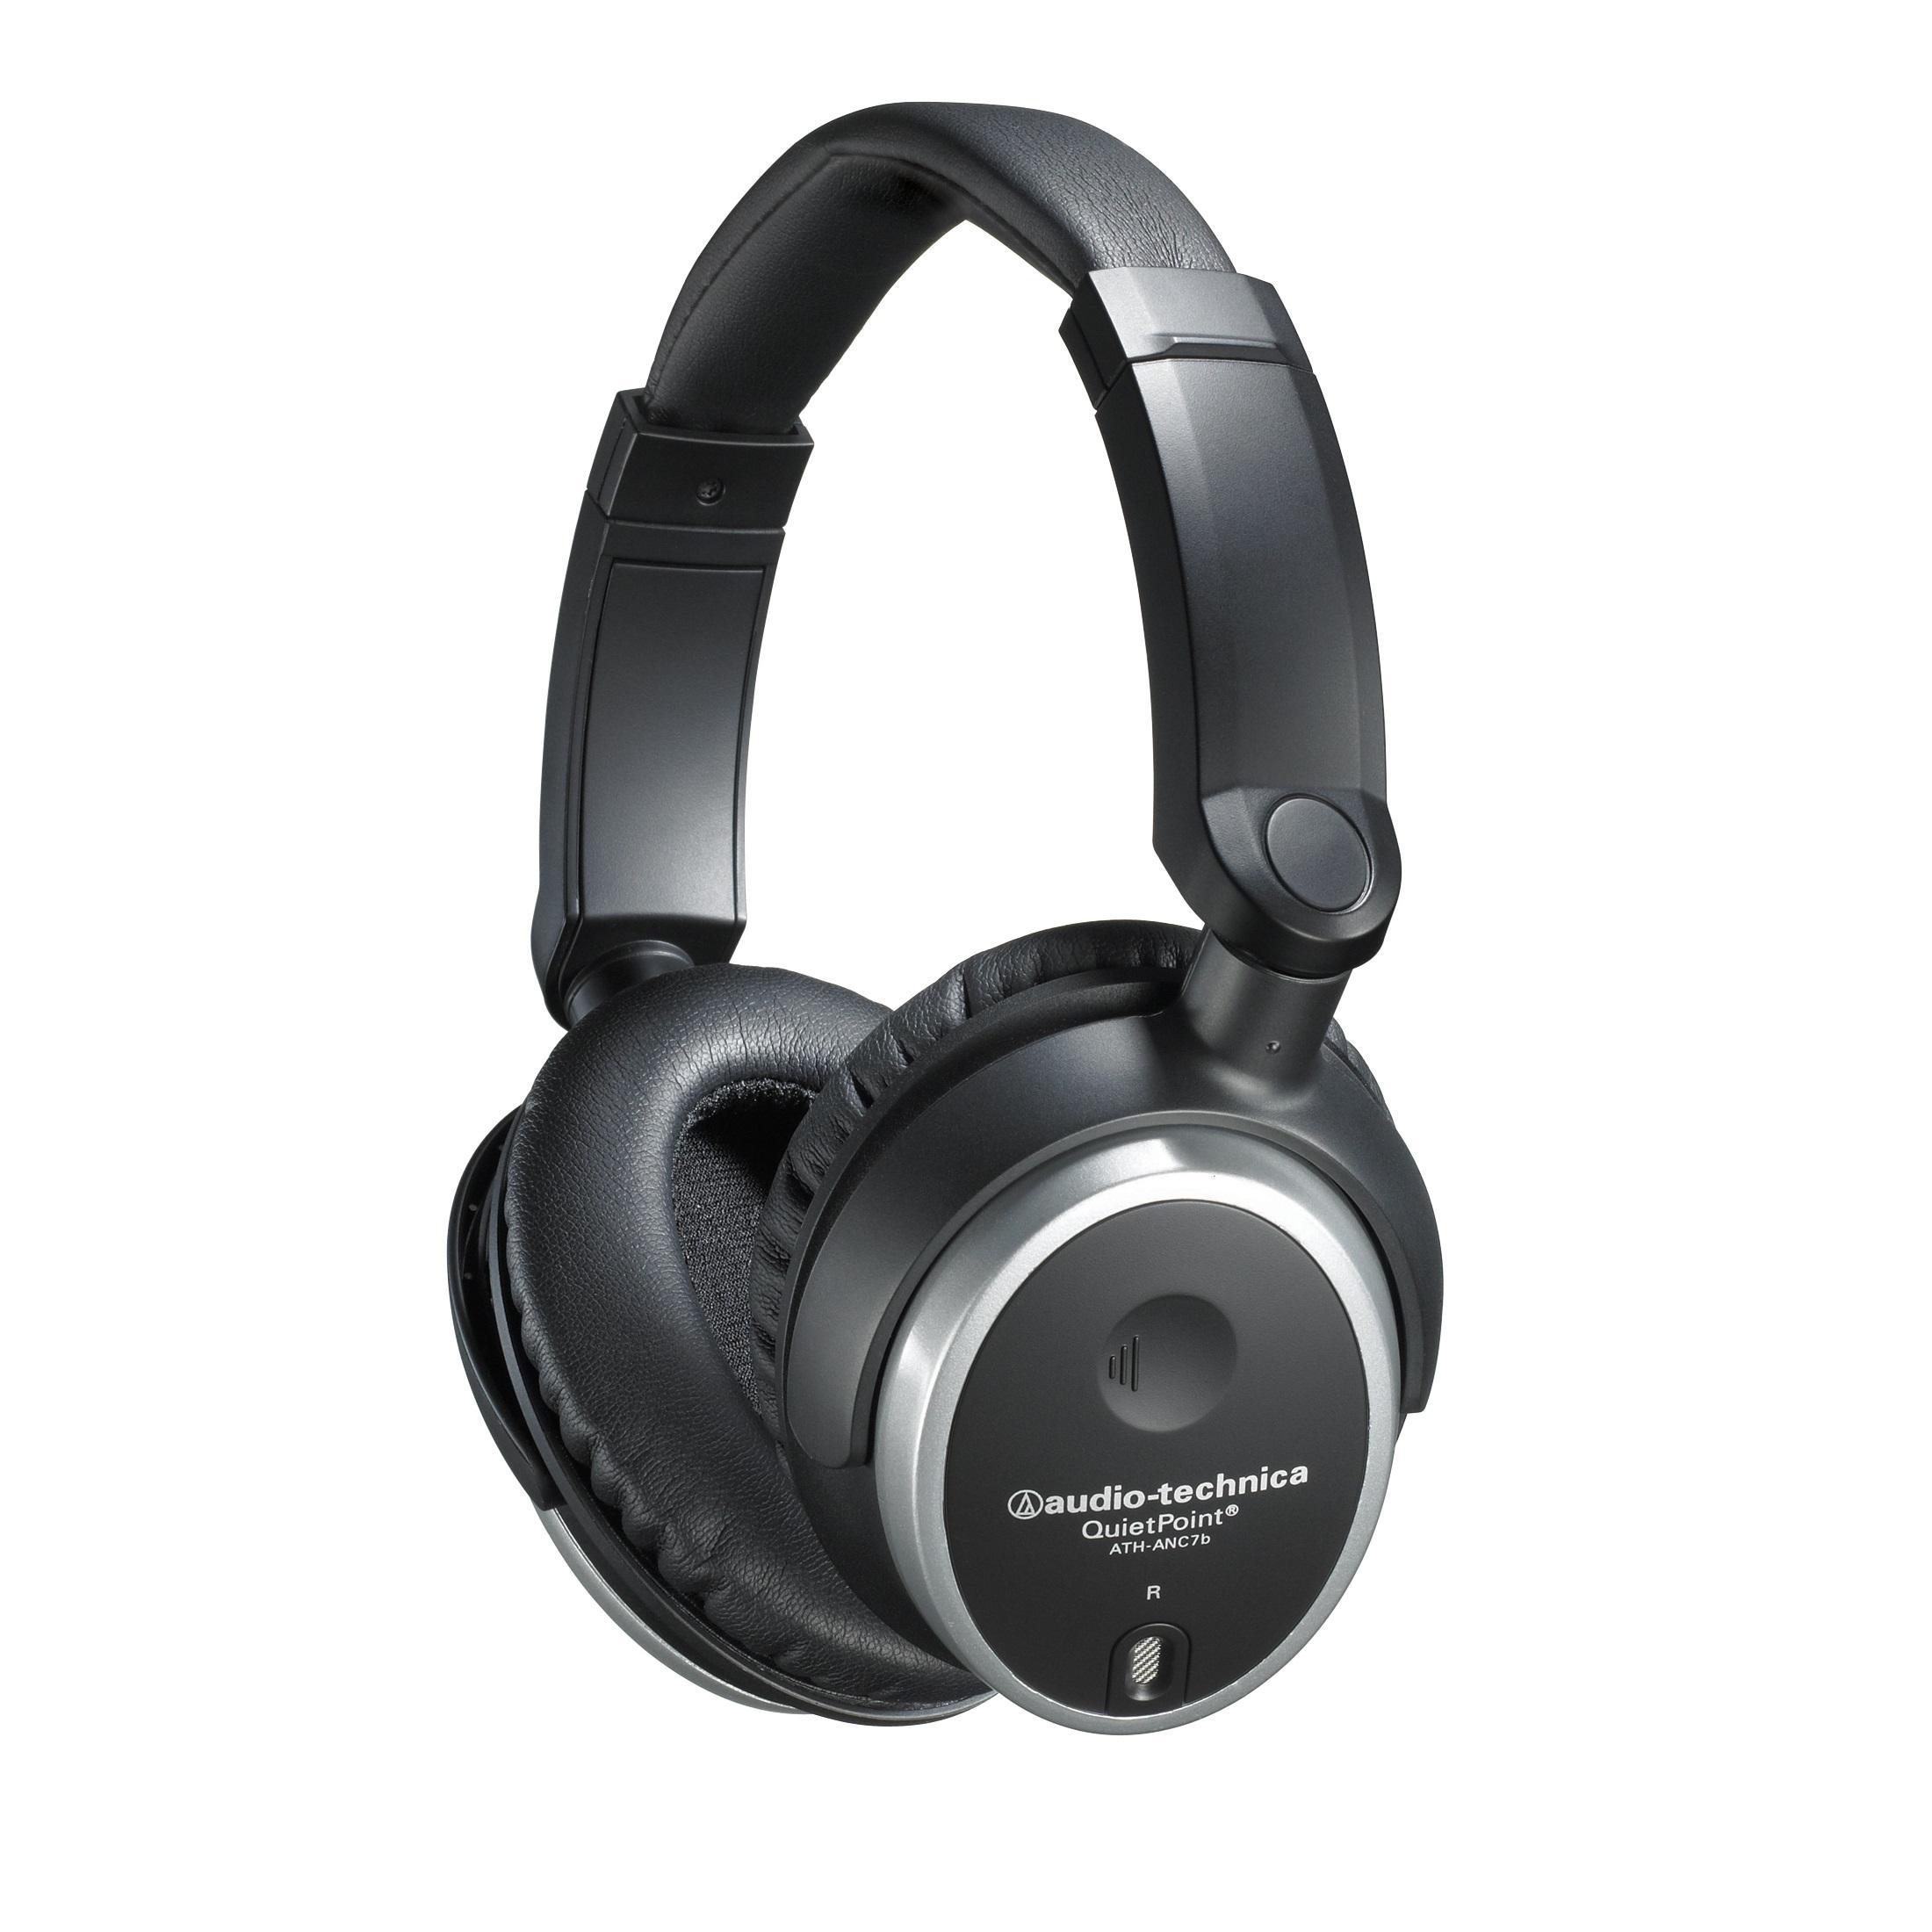 Amazon.com: Audio Technica ATH ANC7B Active Noise